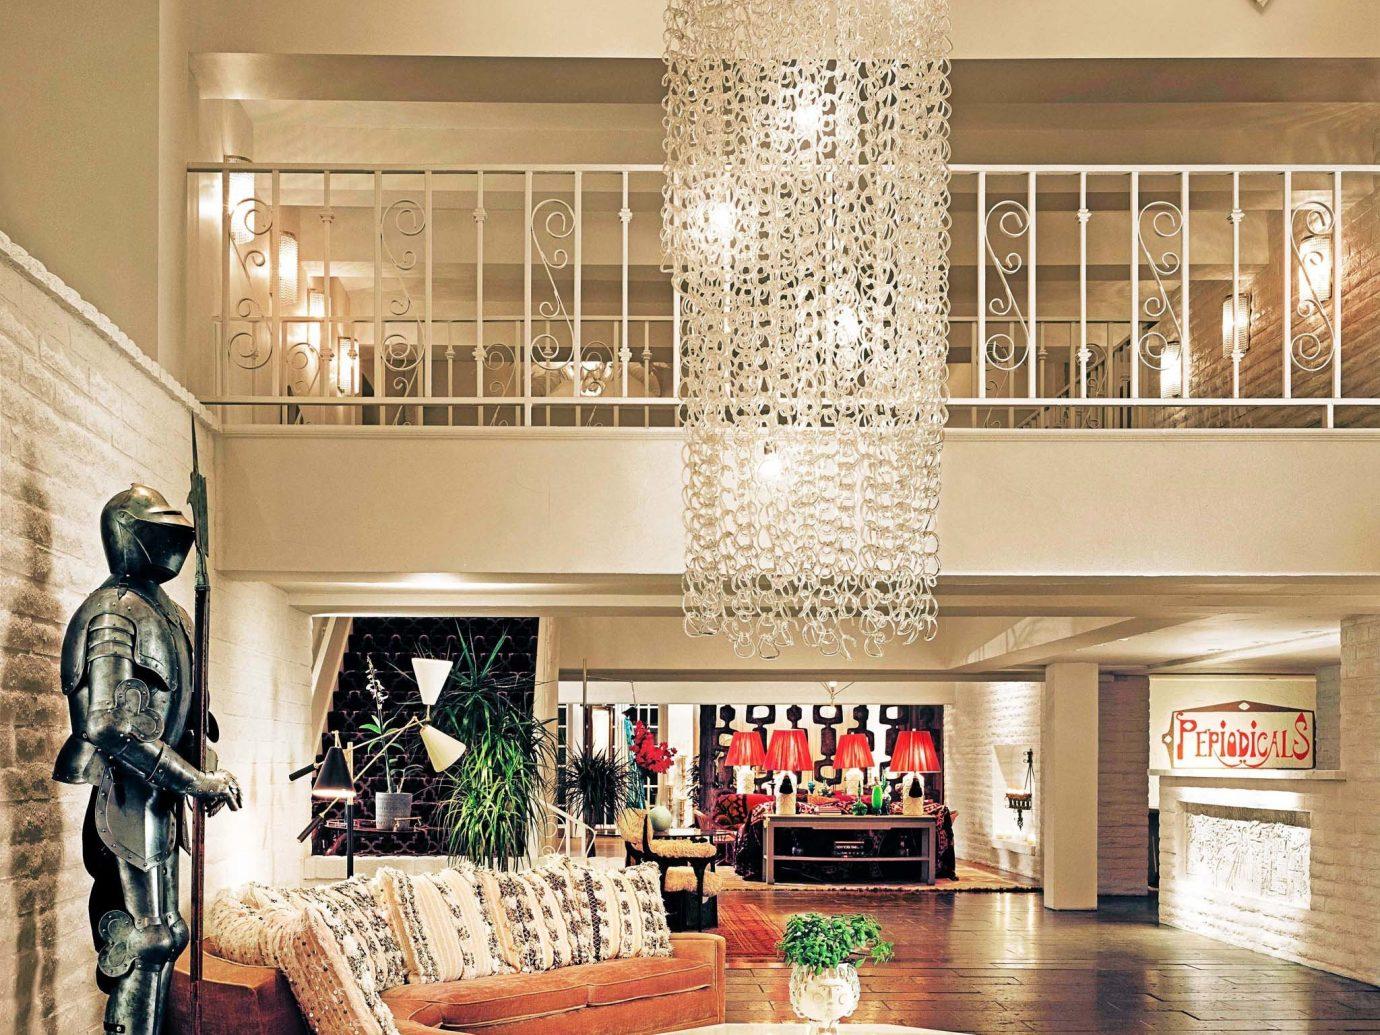 Boutique Hotels Design Festivals + Events Hip Hotels Lobby Modern Trip Ideas indoor room Living living room interior design home estate lighting area furniture